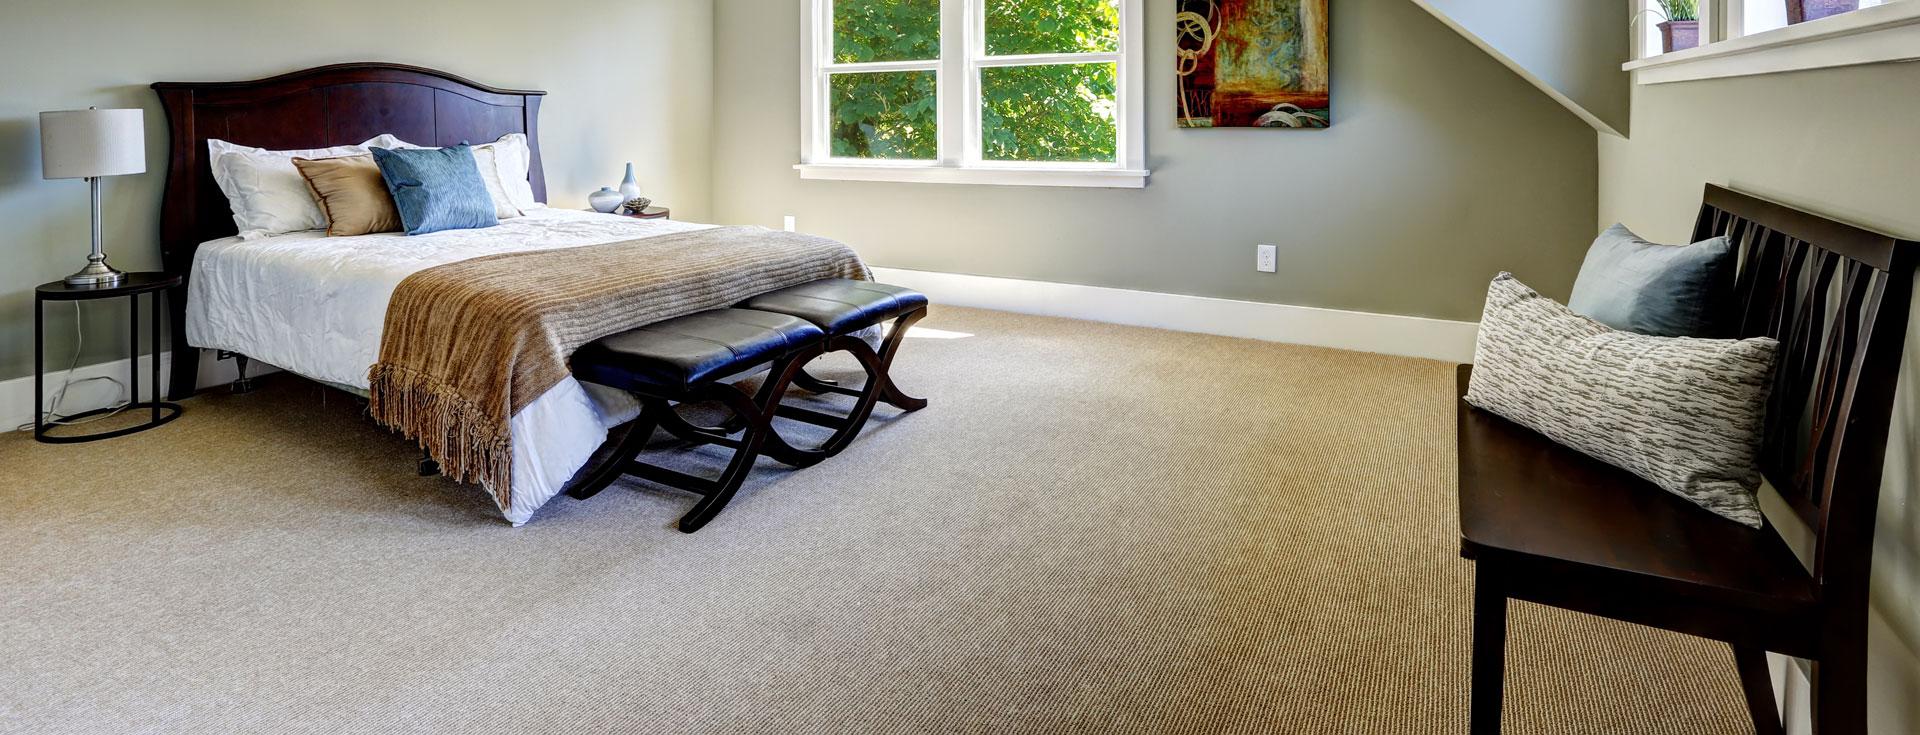 Wilsons Flooring Centre - Carpet